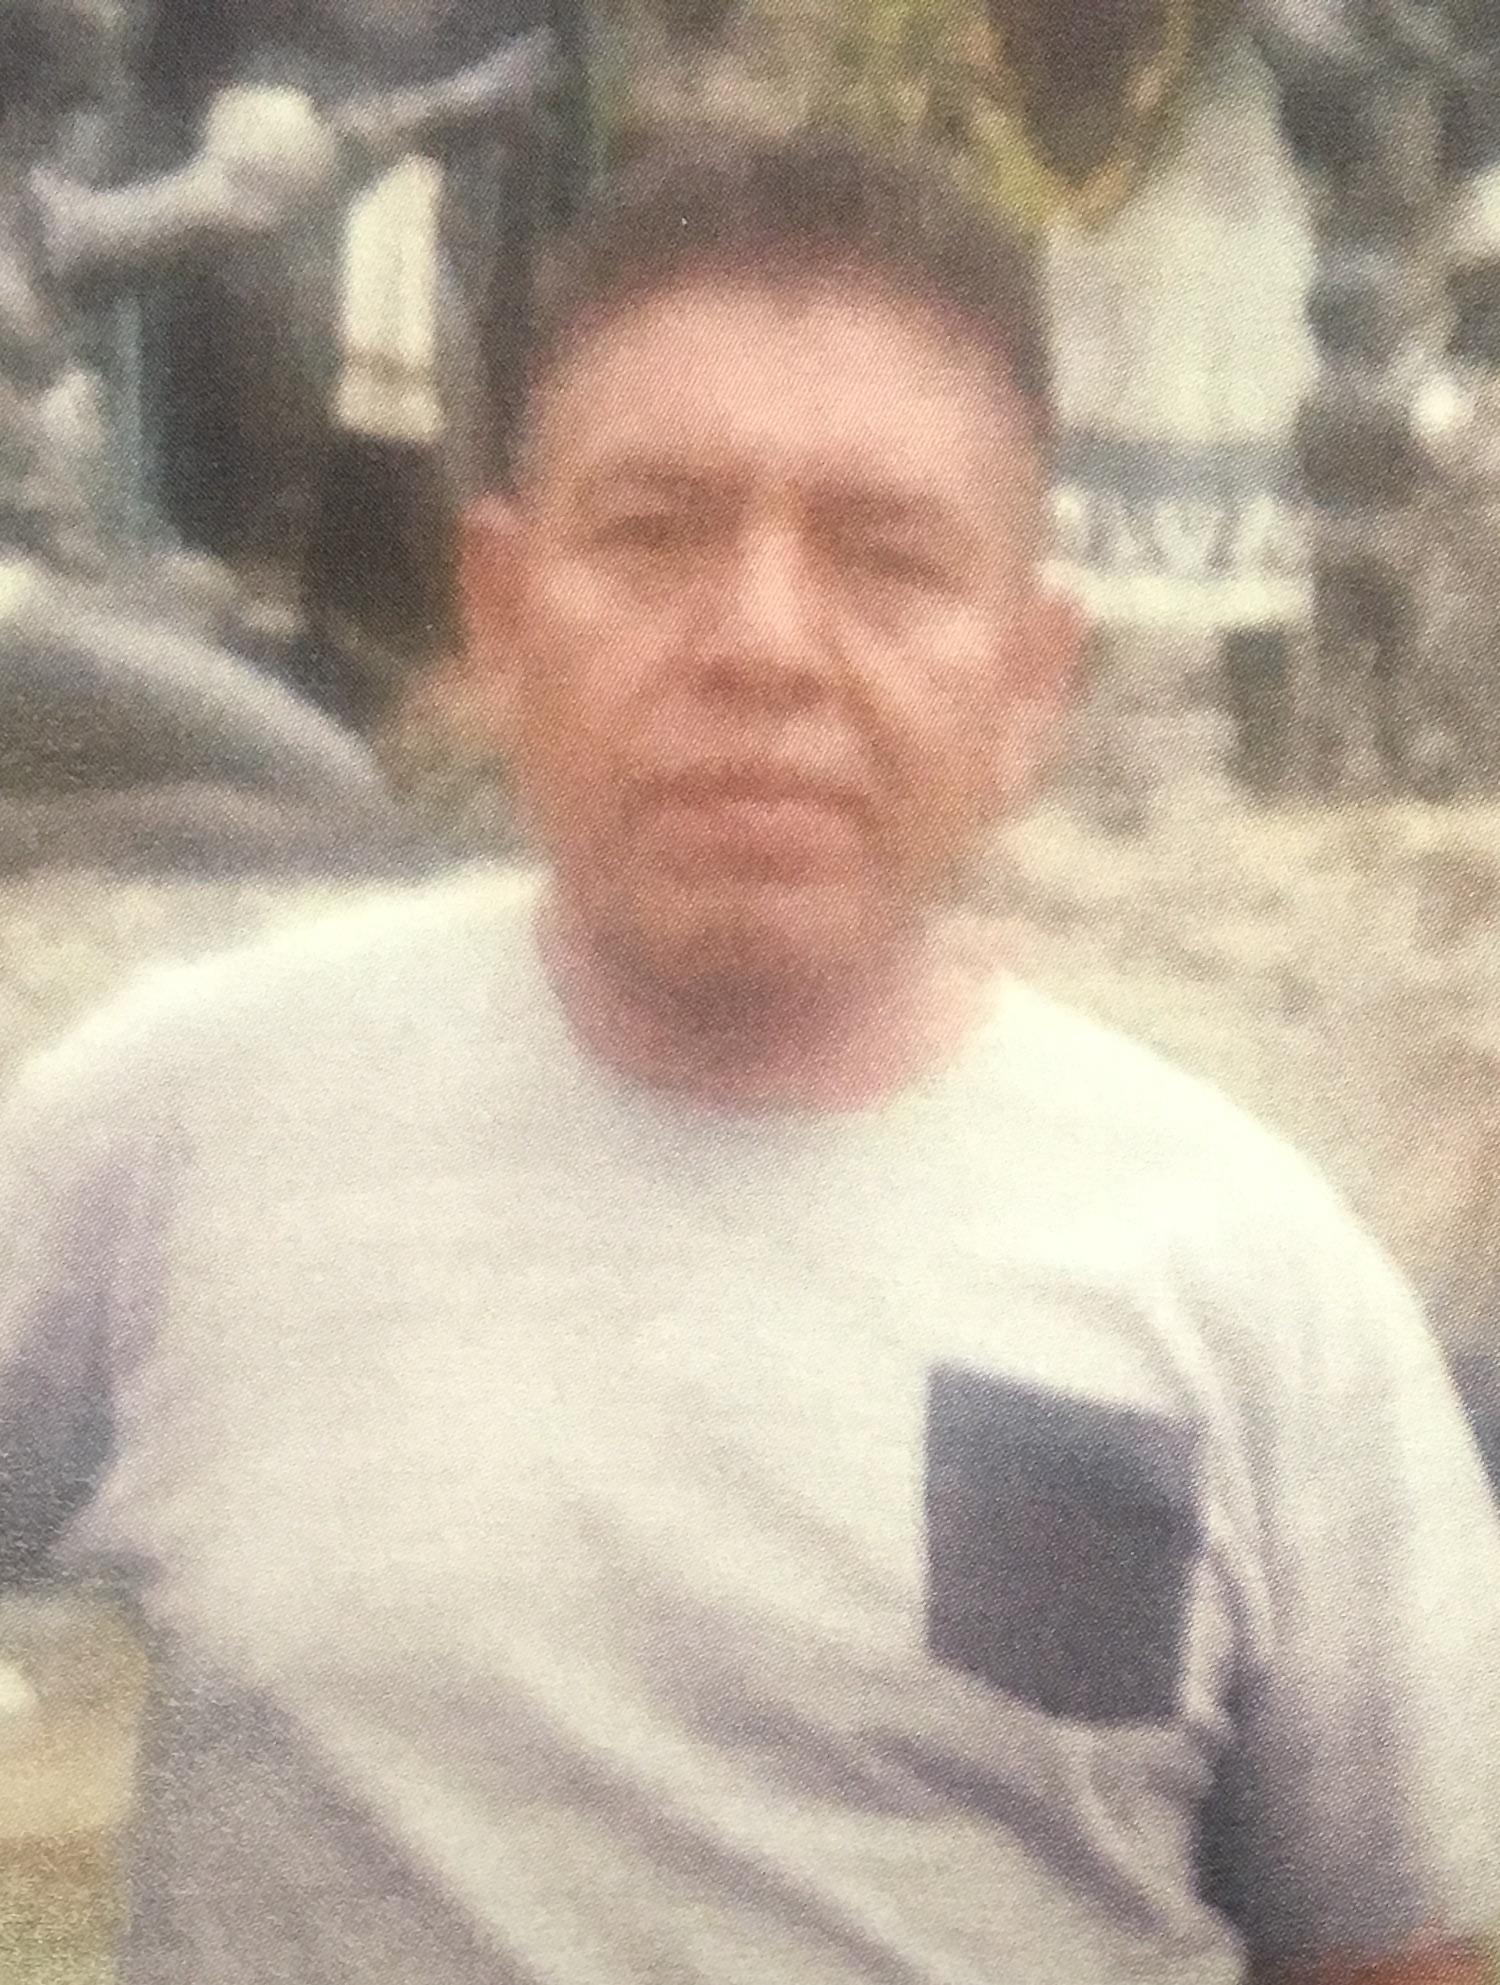 Fernando Cabrera González